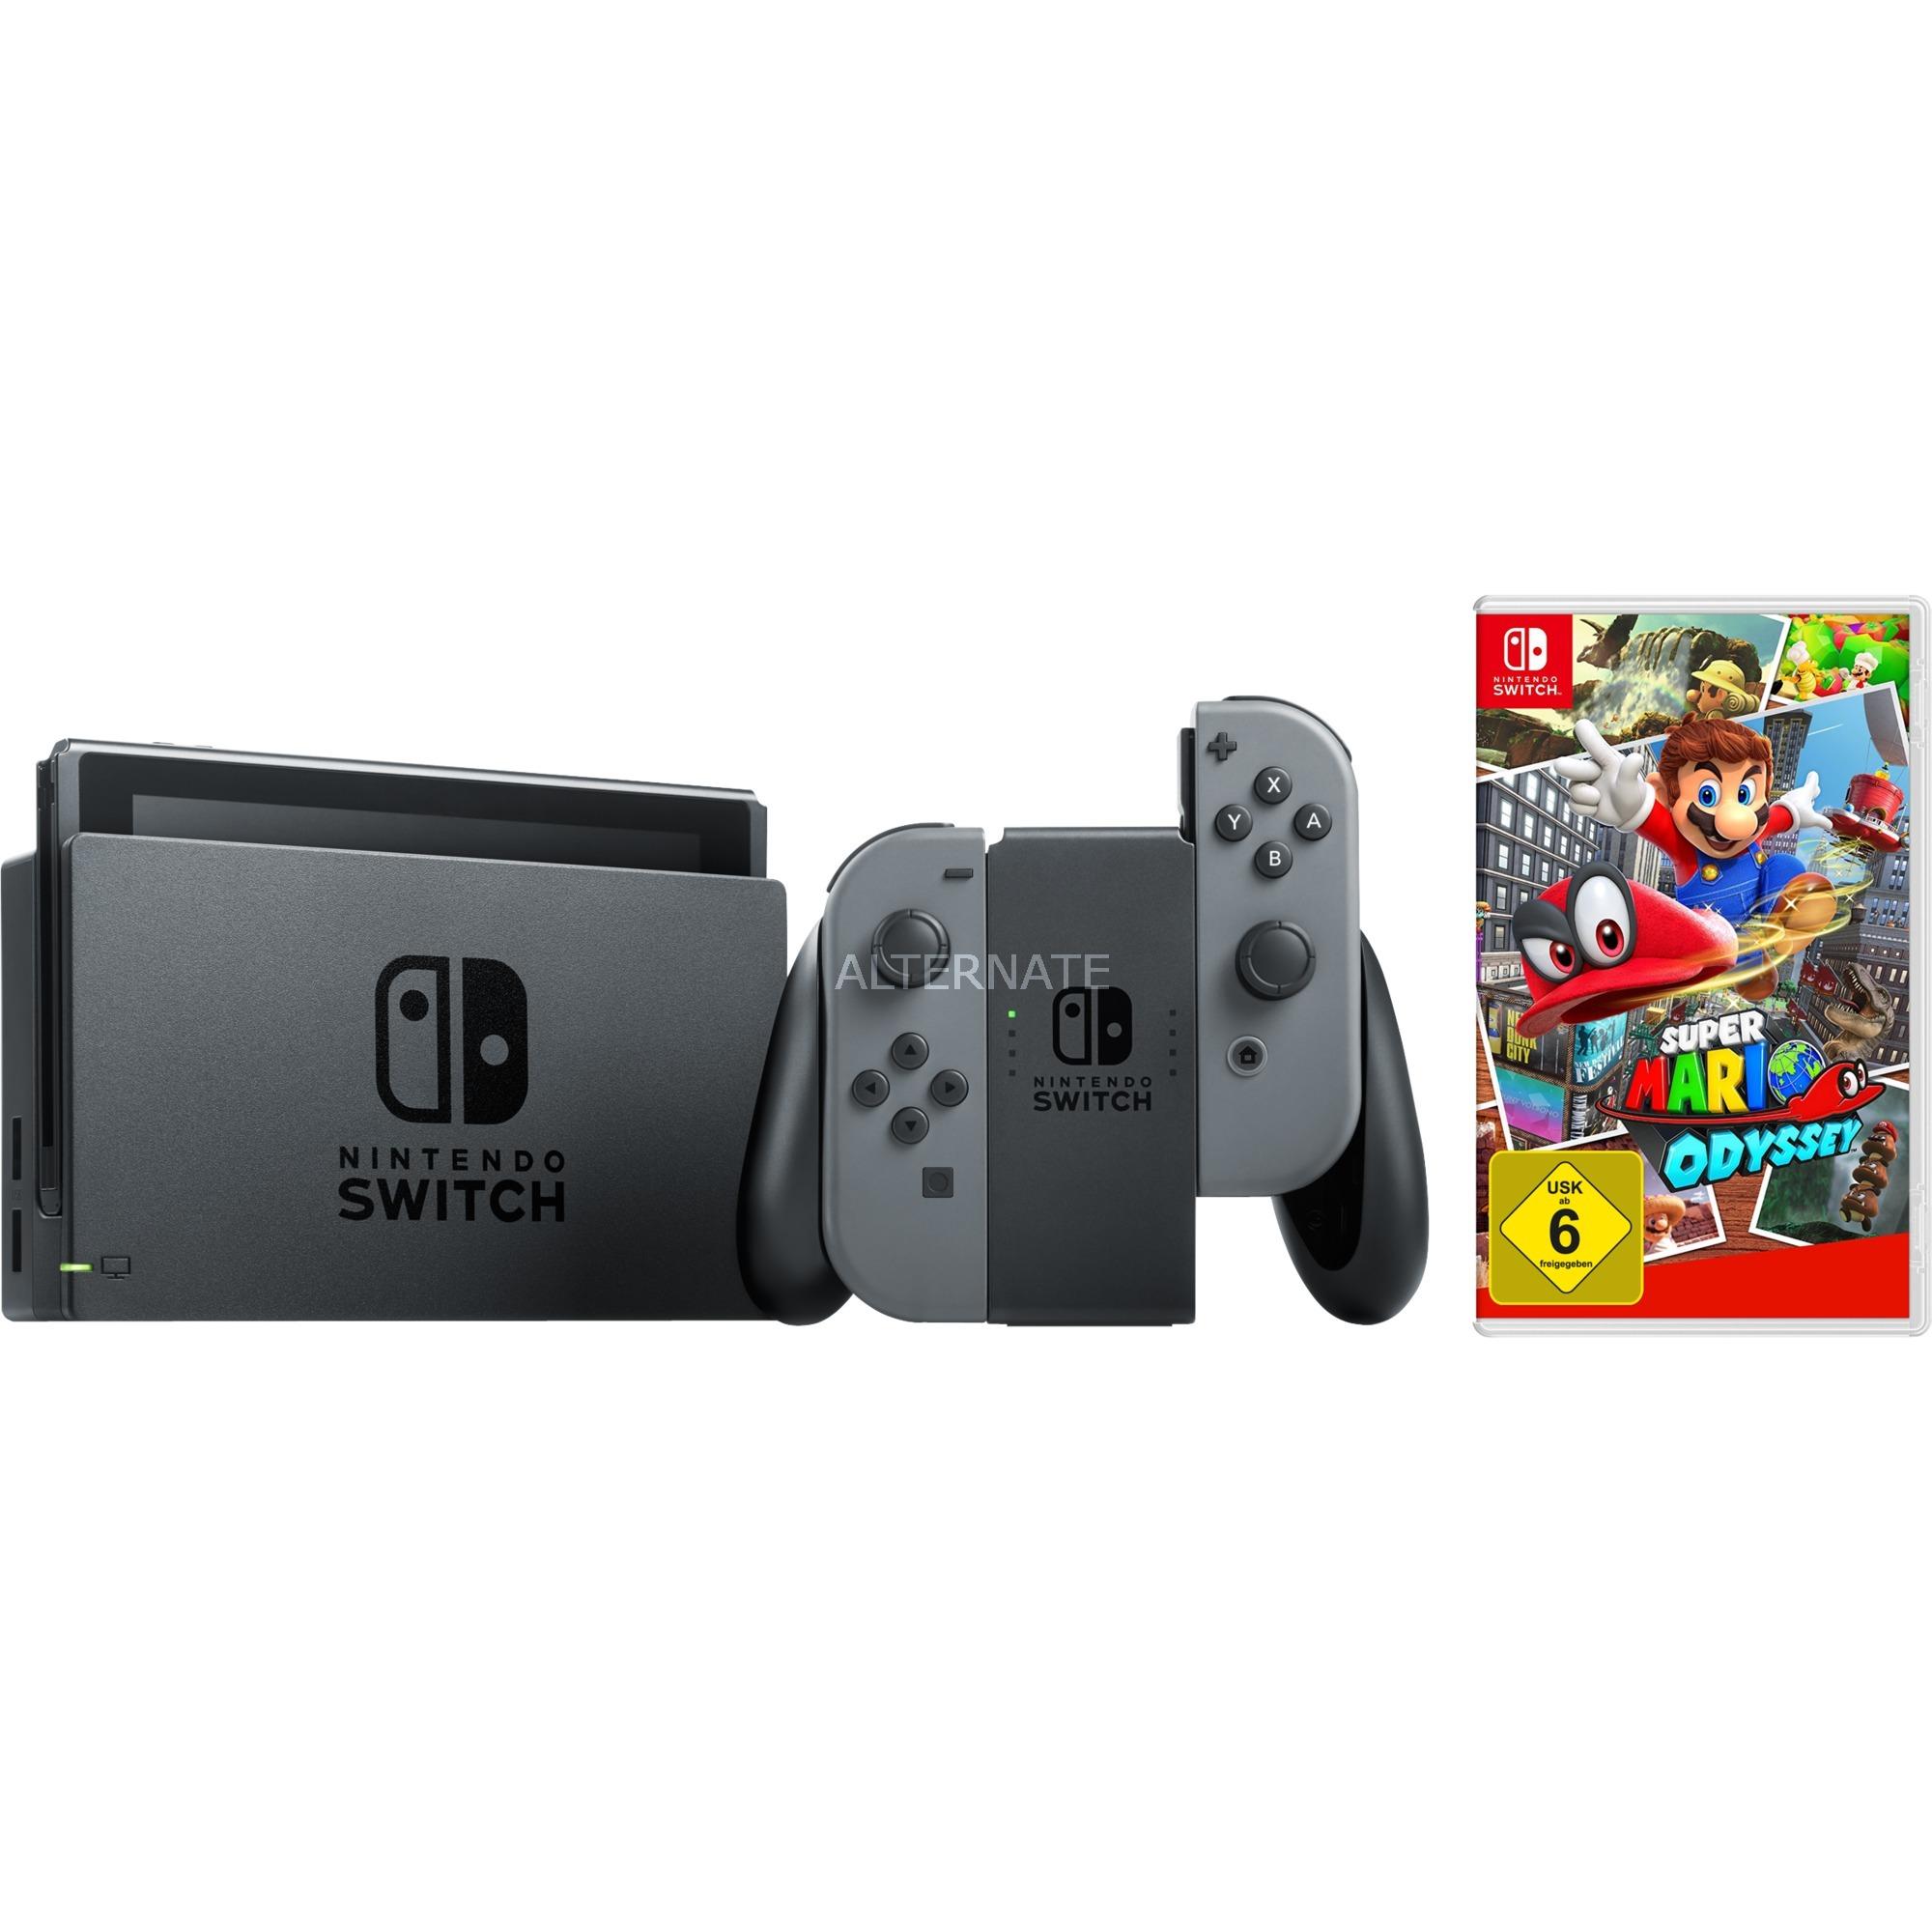 Switch, Videoconsola